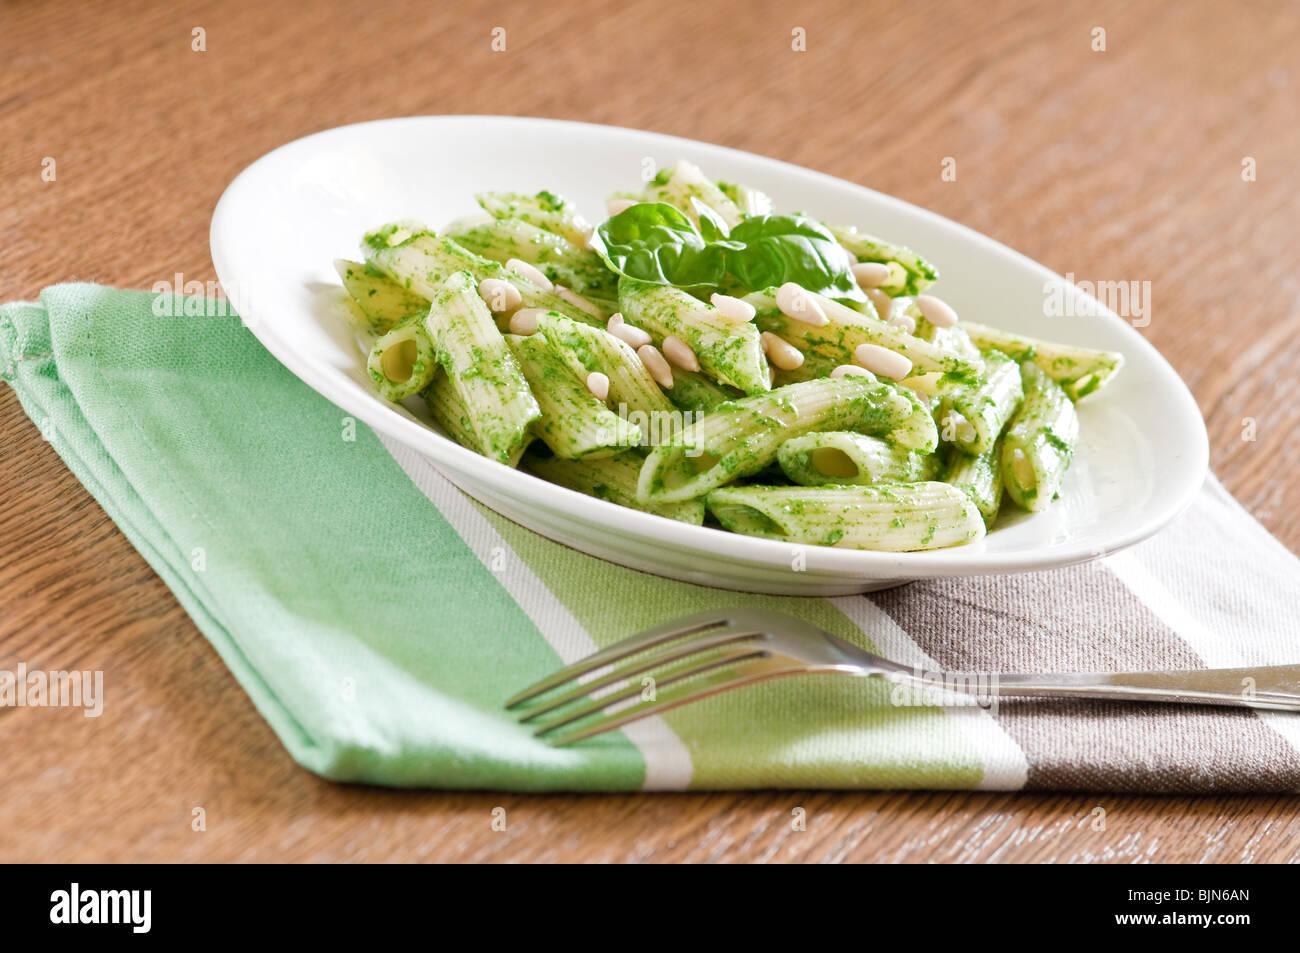 pasta with sauce pesto on table - Stock Image